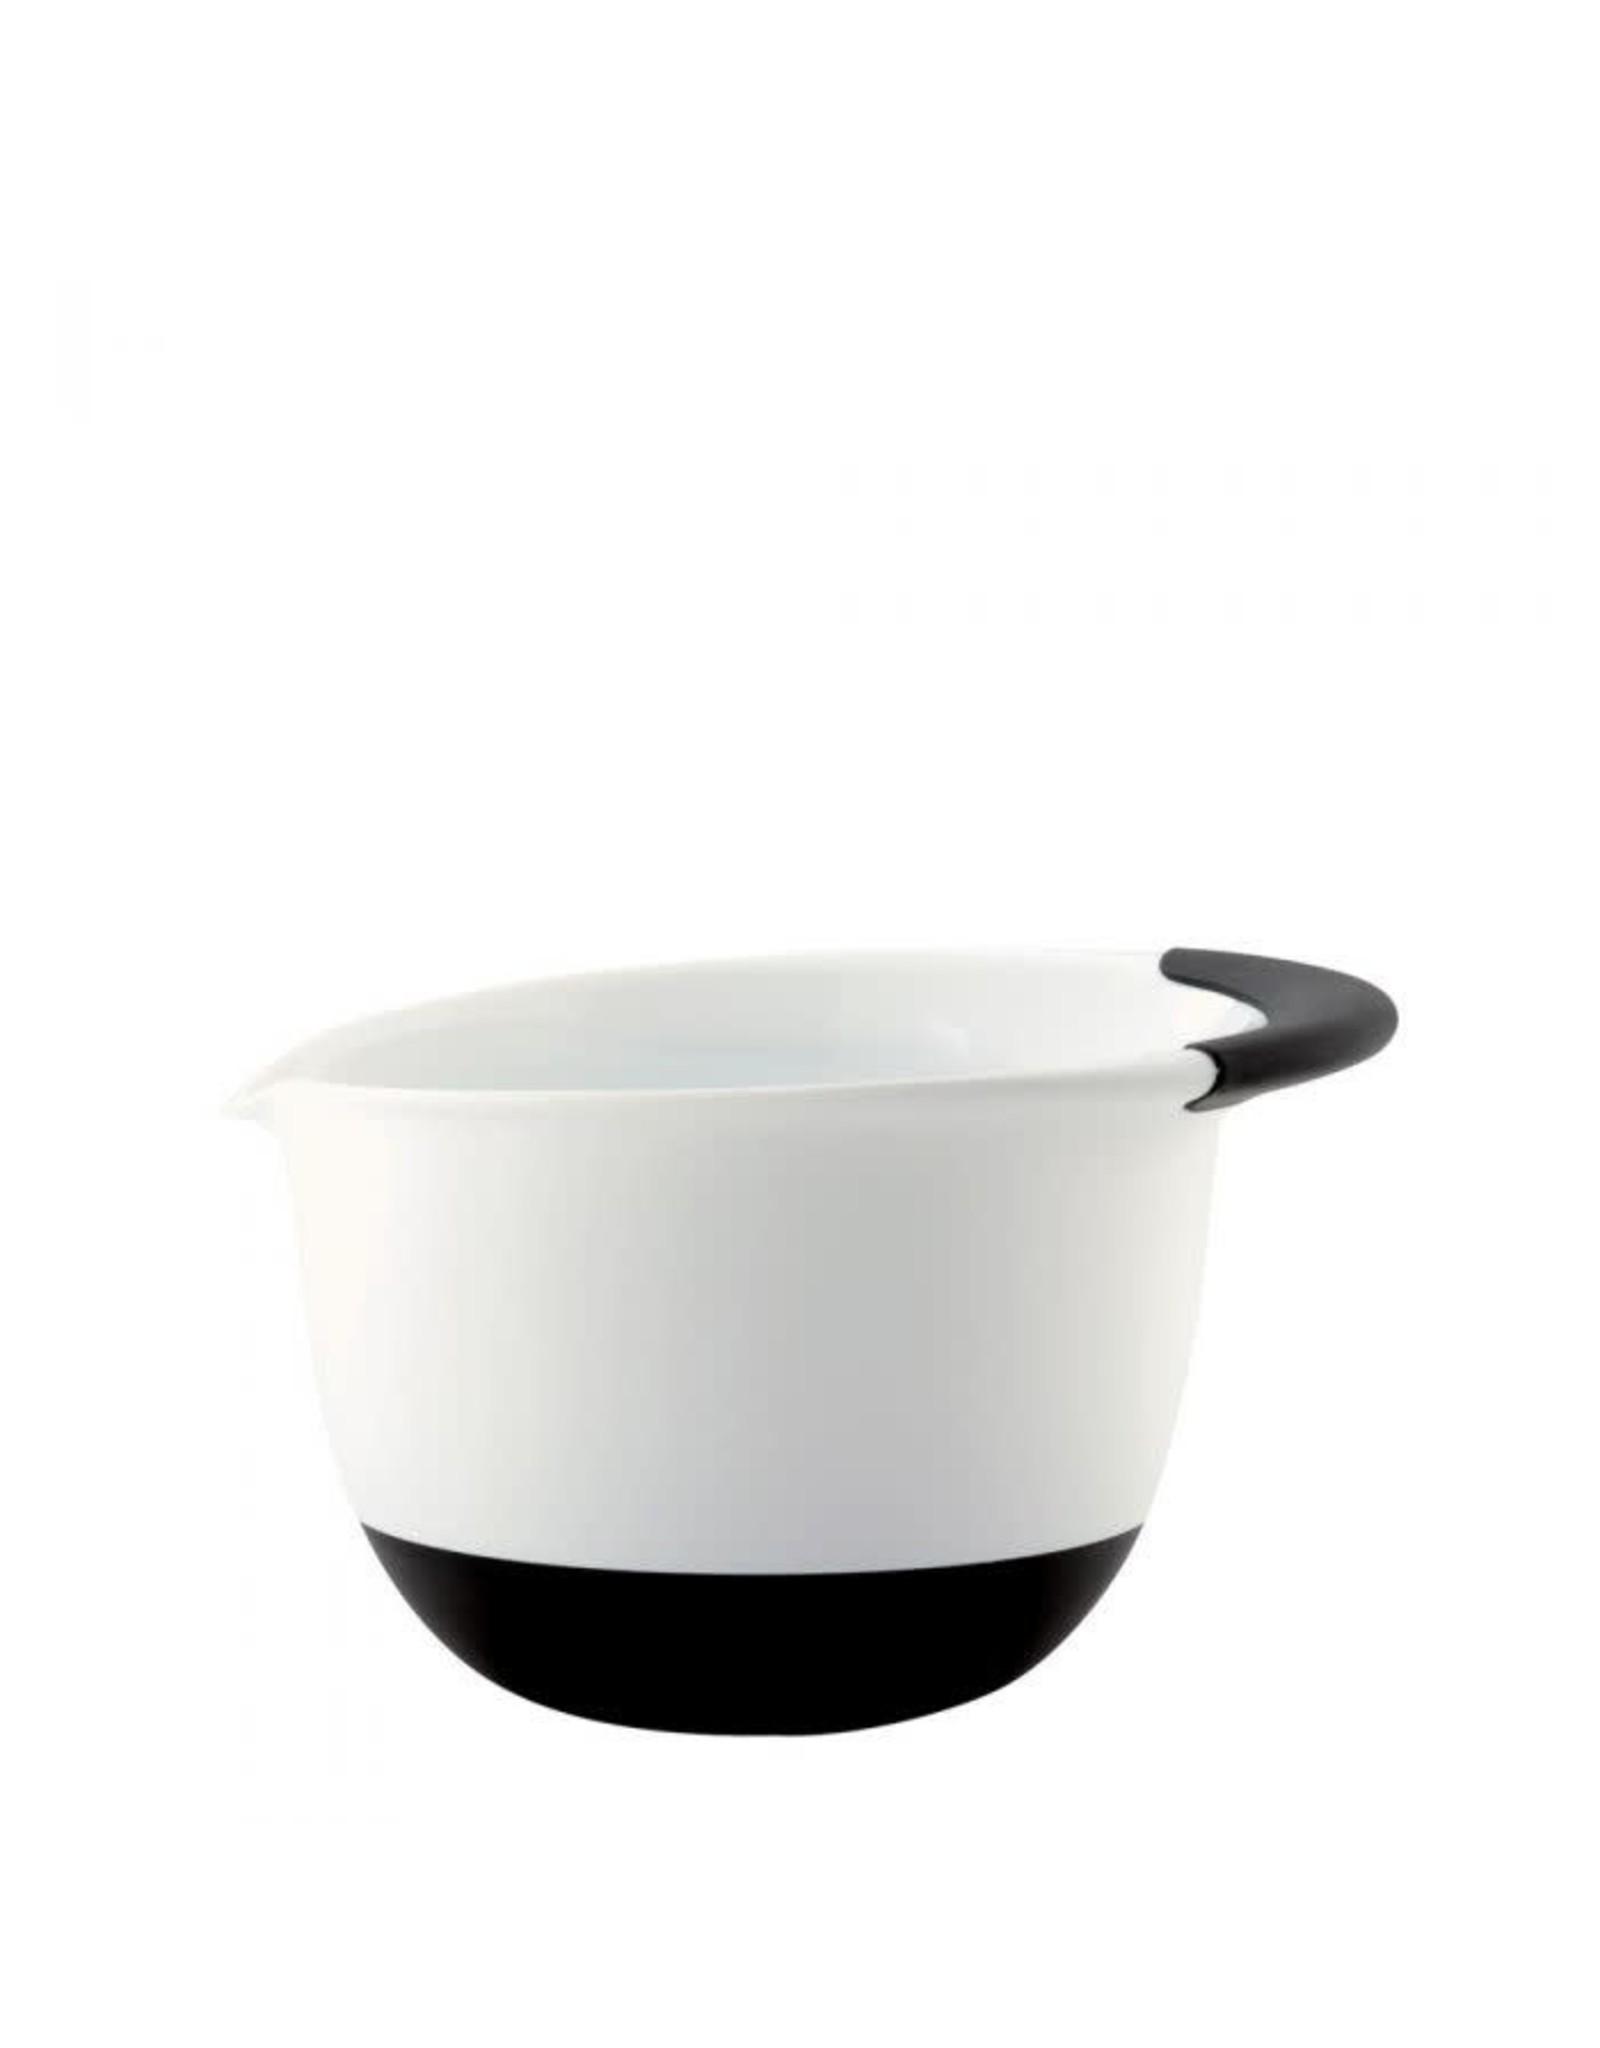 Oxo Mixing Bowl-1.5 Quart